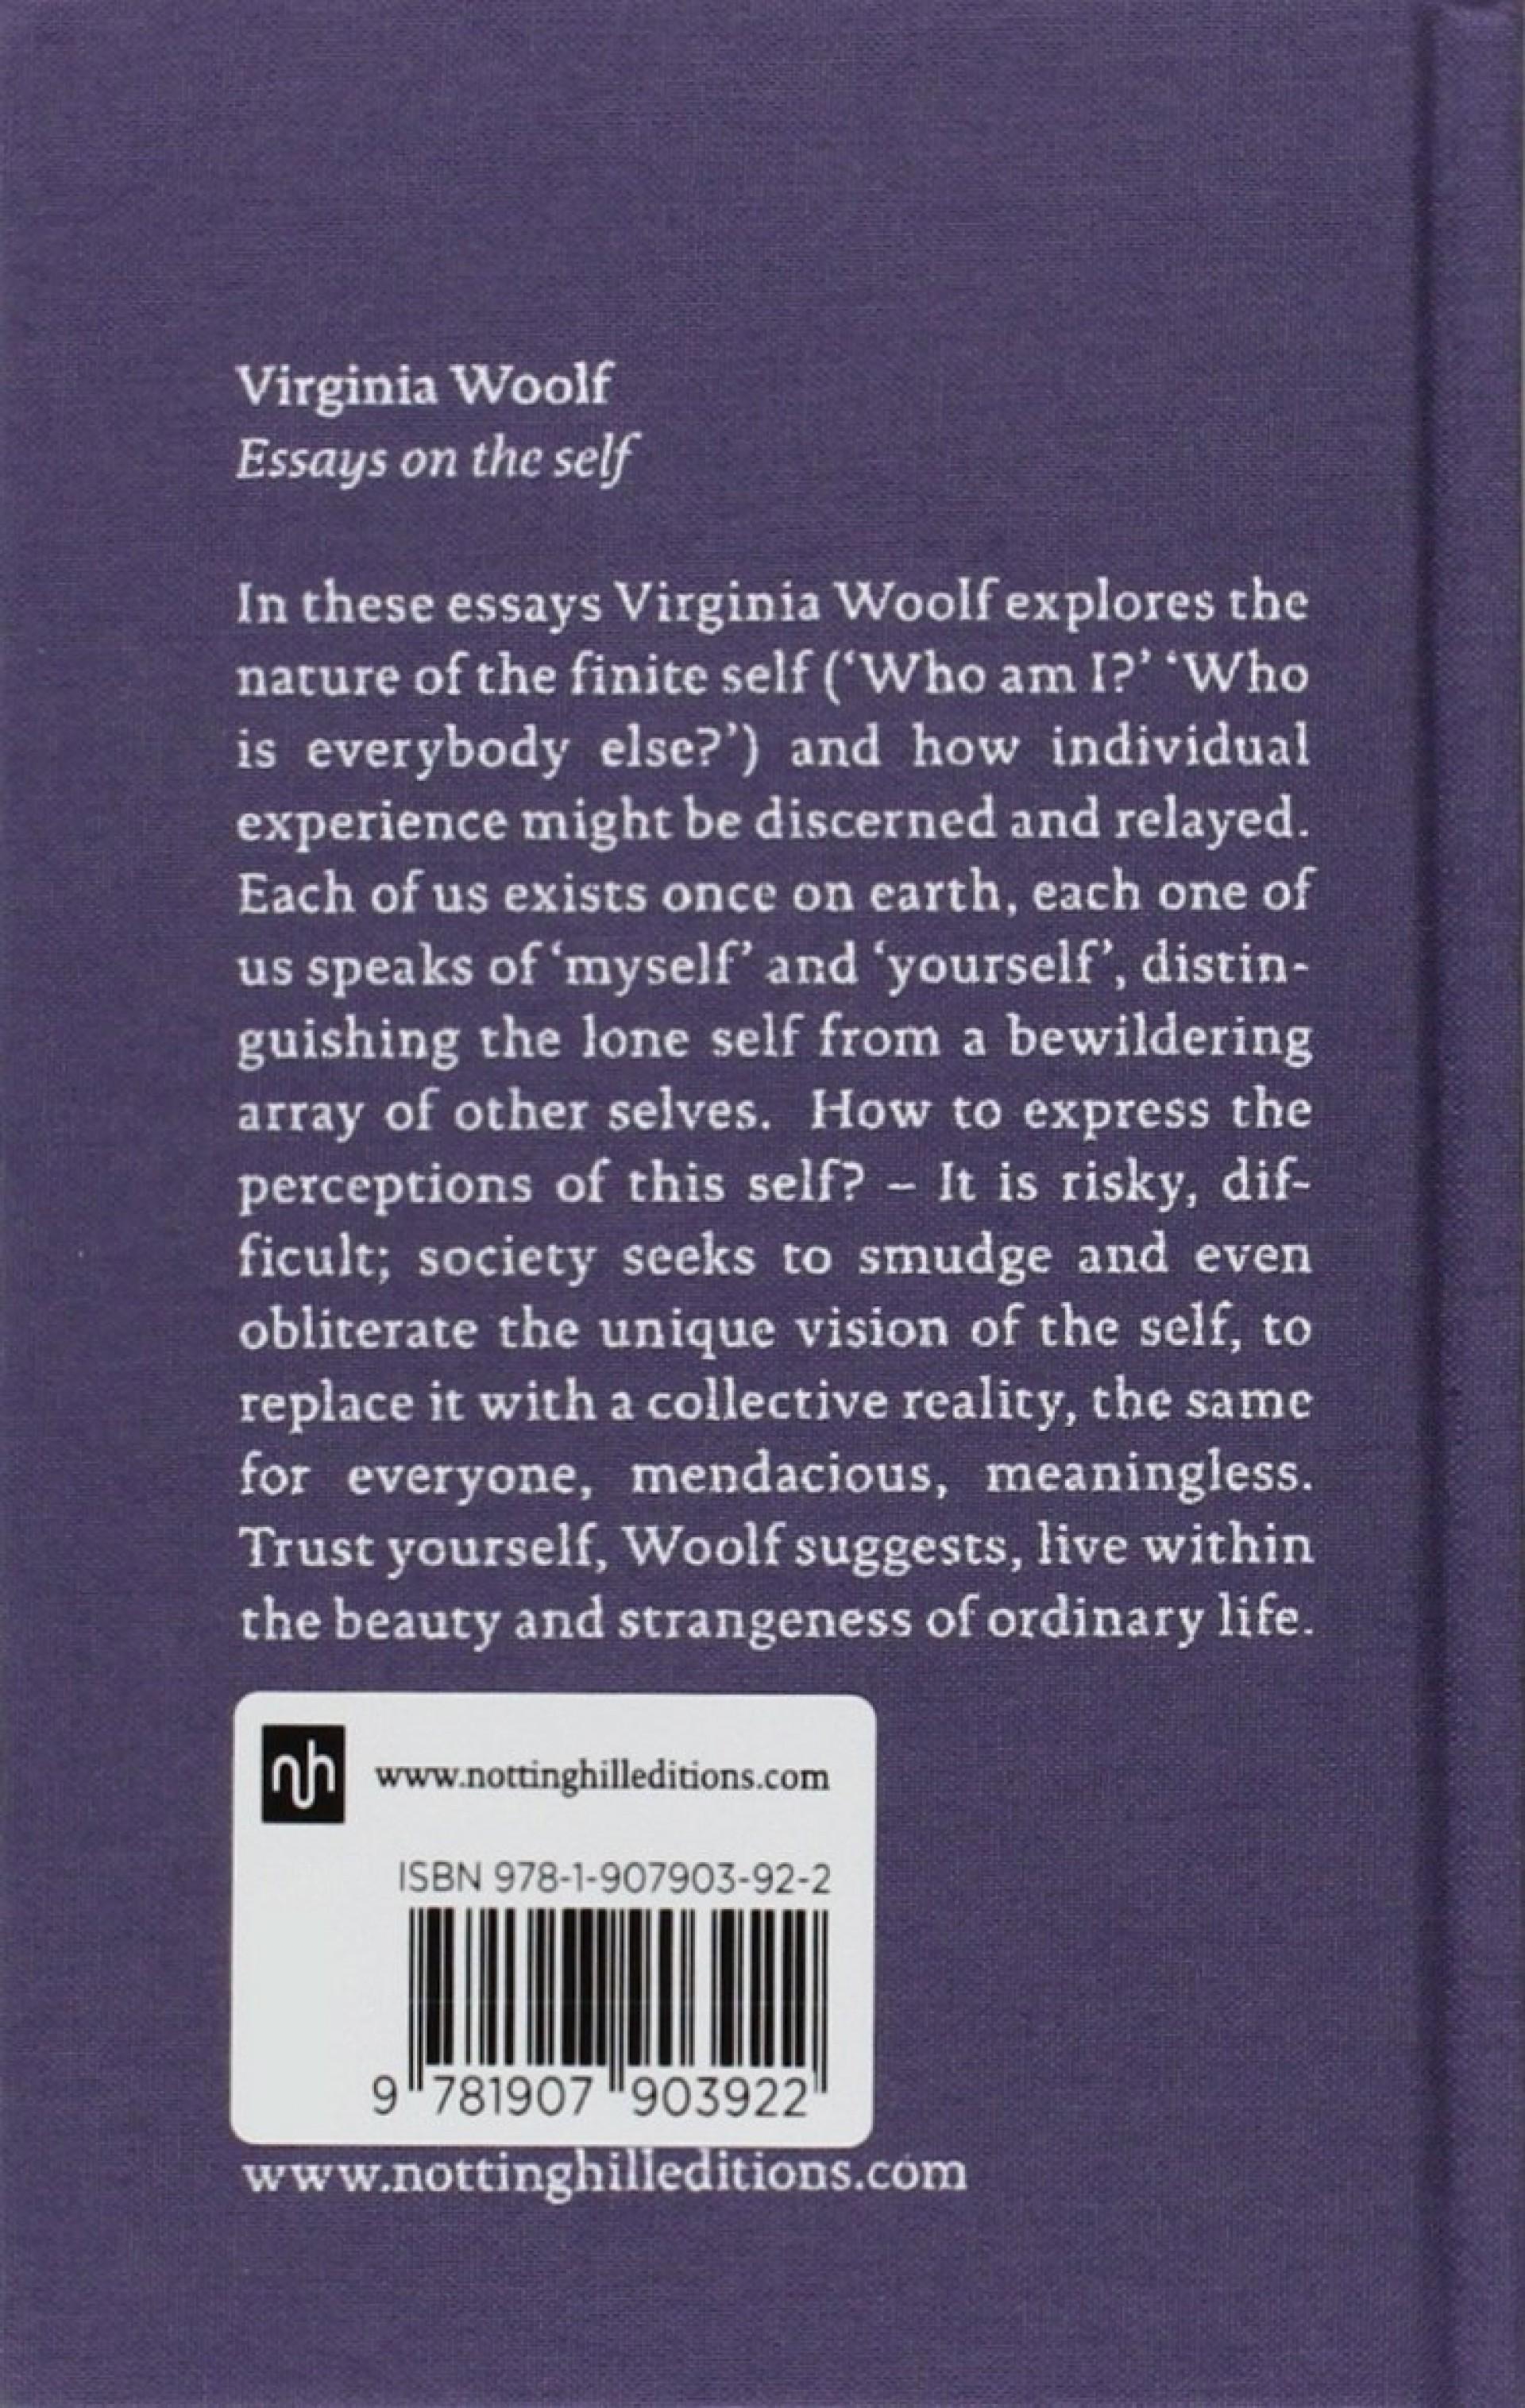 005 Virginia Woolf Essays 71jqd2u92bhl Essay Unusual Online The Modern Analysis On Self 1920